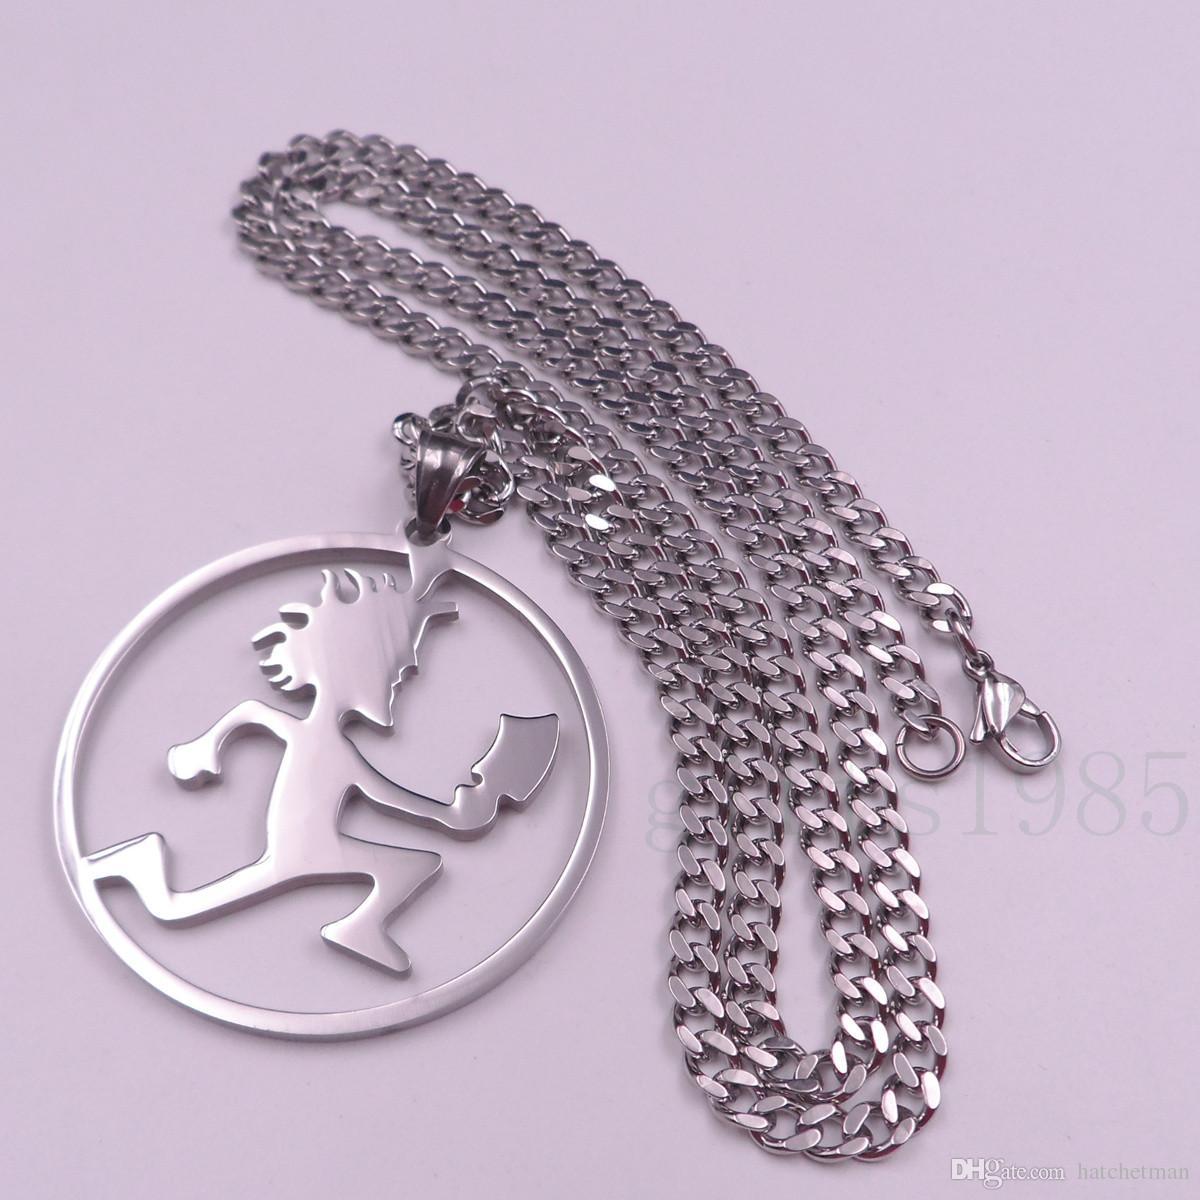 ICP HATCHET MAN CIRCLE CZ PENDANT Cadena de collar de acero inoxidable w30